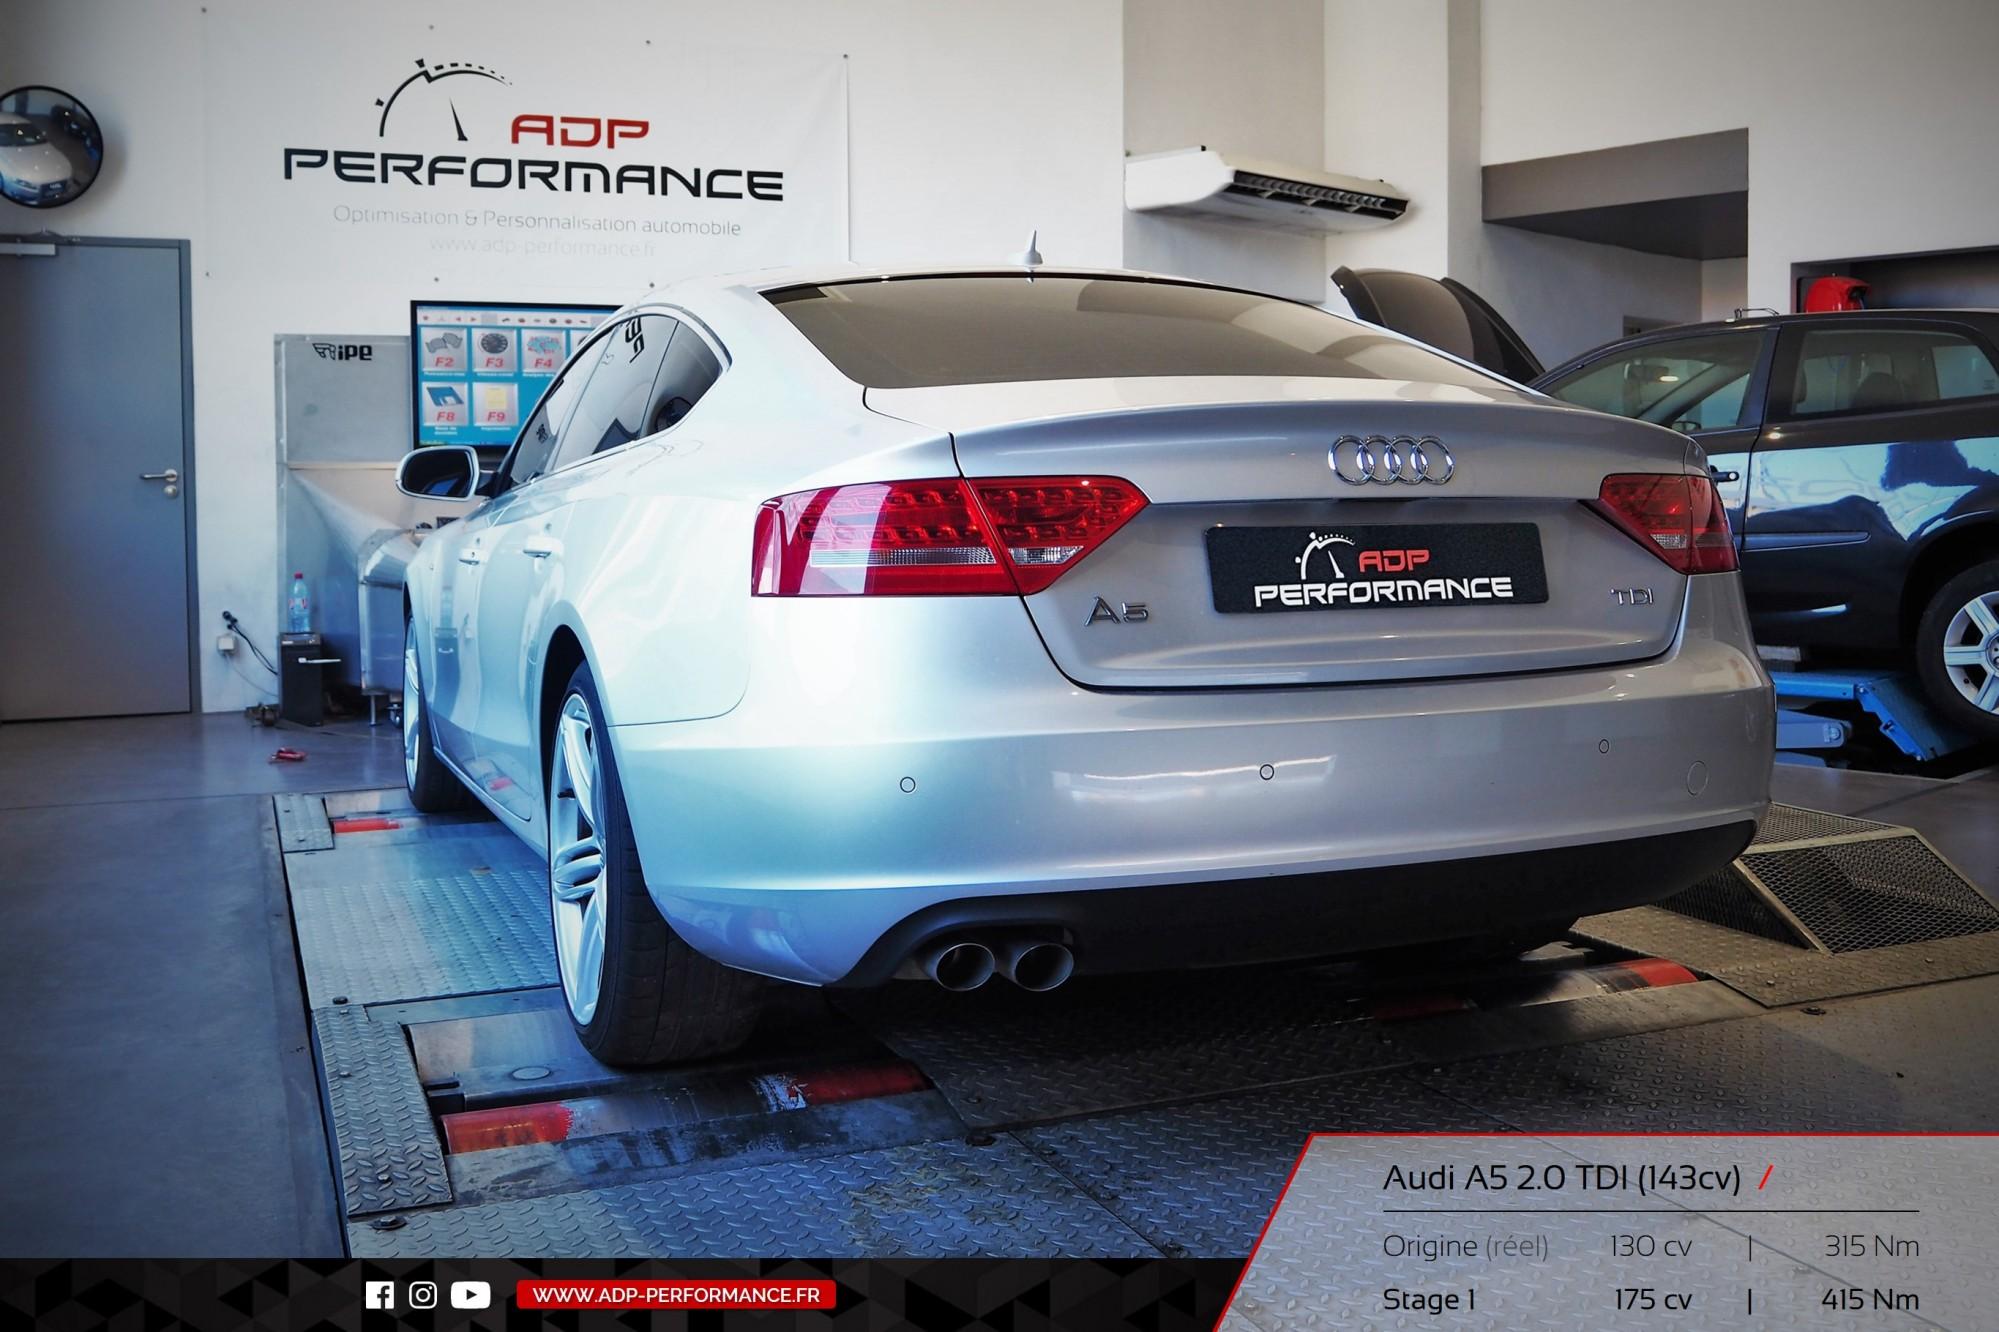 Reprogrammation moteur Plan de Campagne, Aubagne, La Ciotat Audi A5 Mk2 2.0 TDI 143cv - ADP Performance